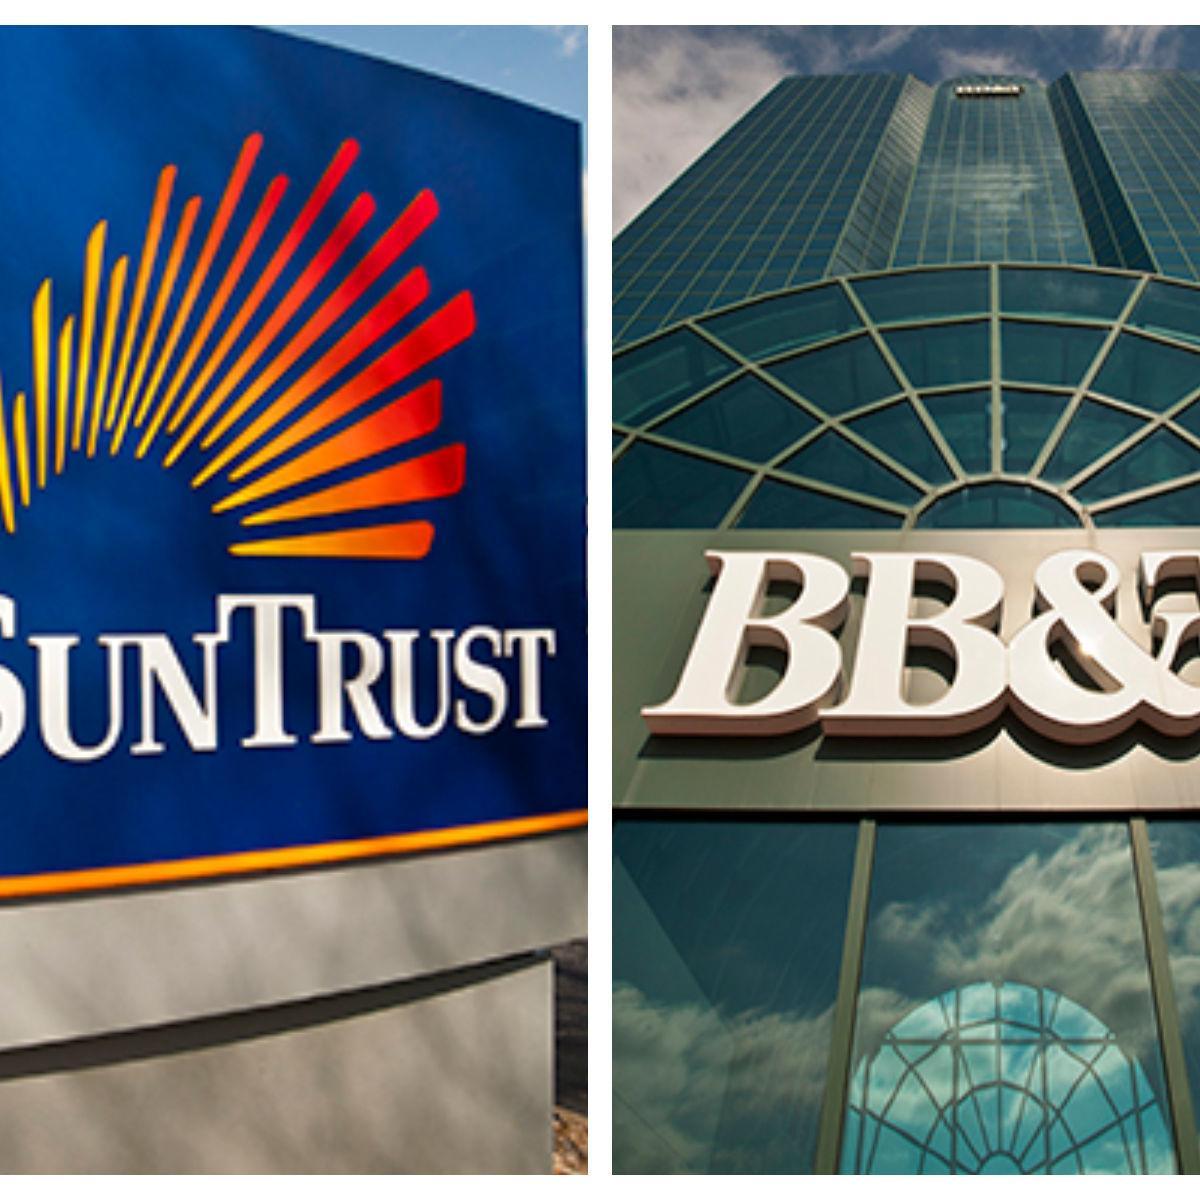 The name Truist sparks lawsuit against BB&T, SunTrust